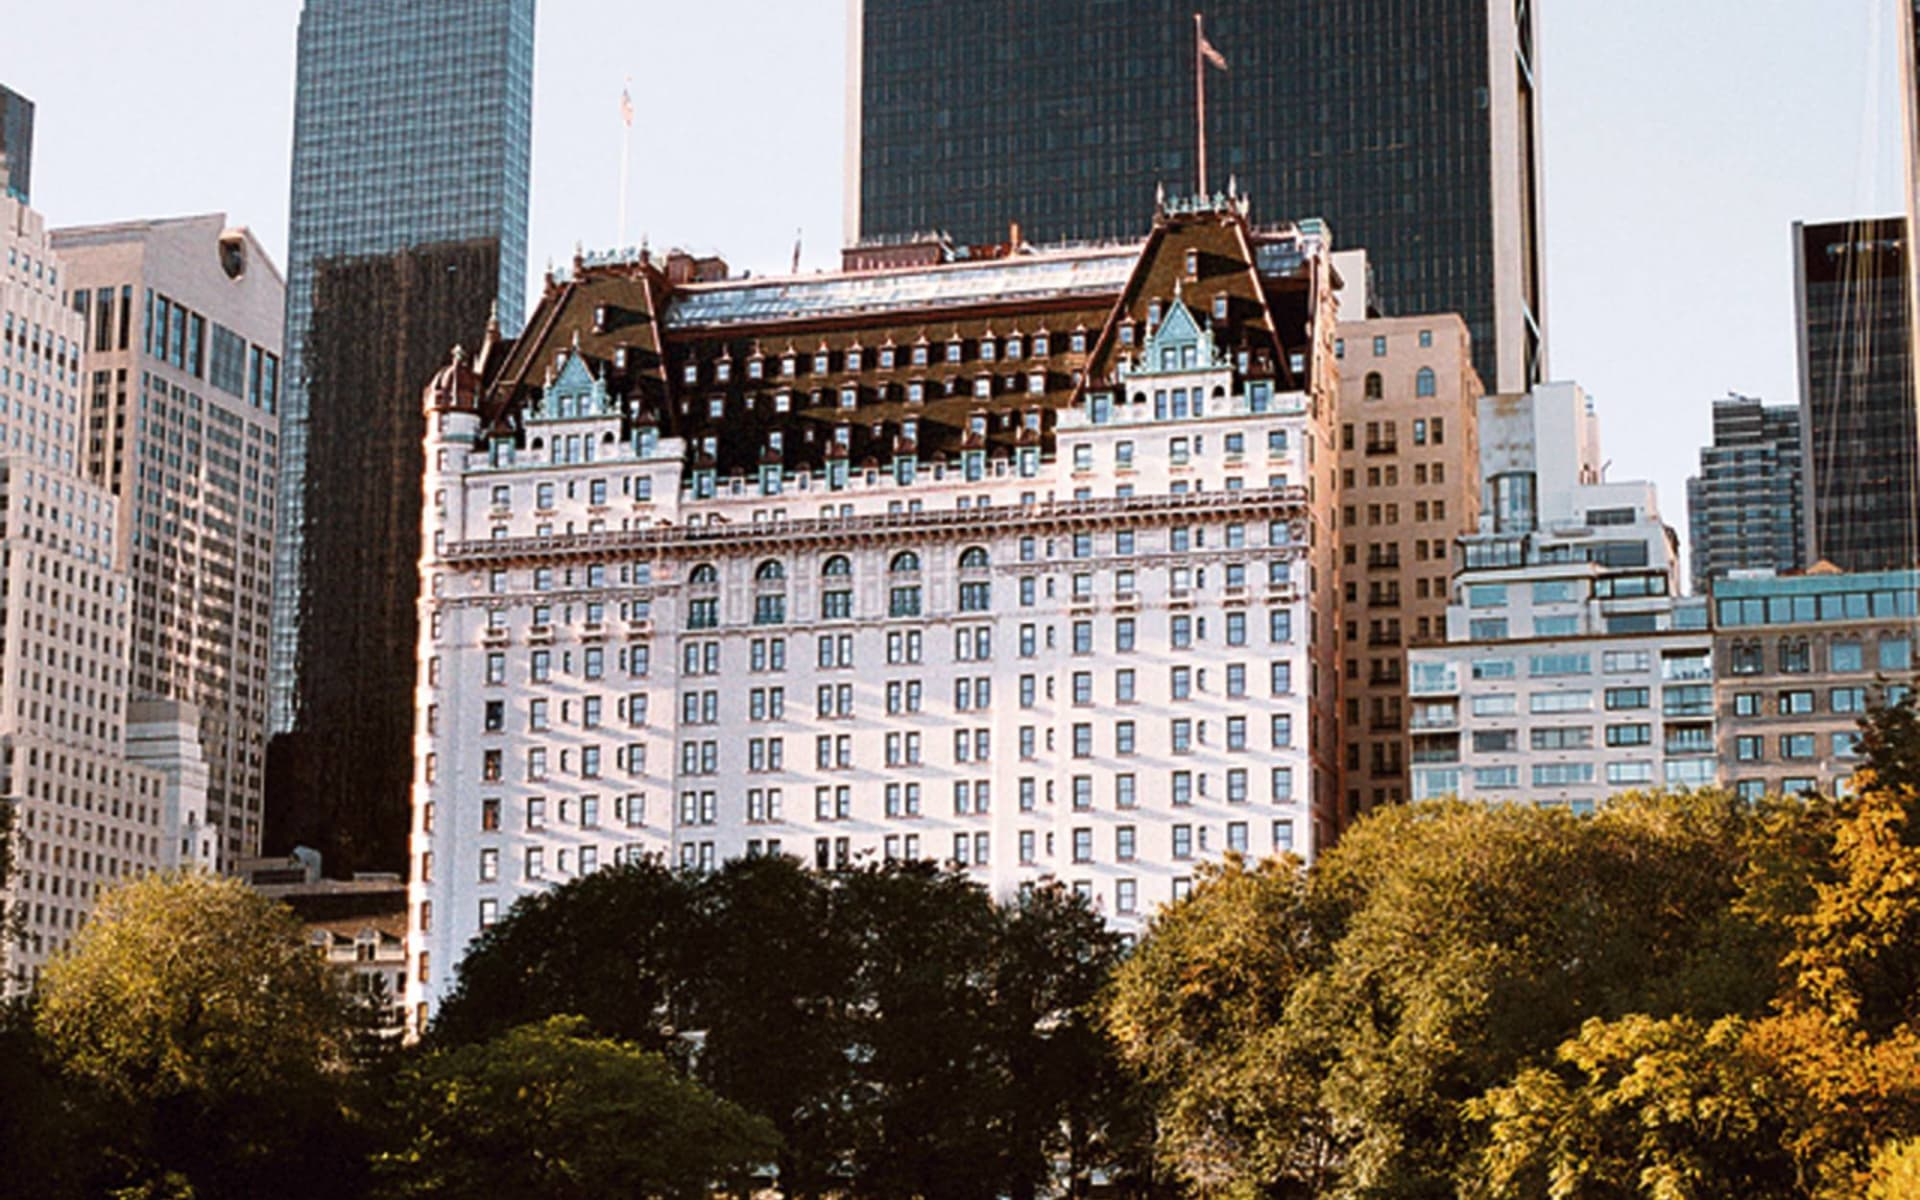 The Plaza Hotel in New York - Manhattan:  The Plaza NY - Hotelansicht mit Bäumen